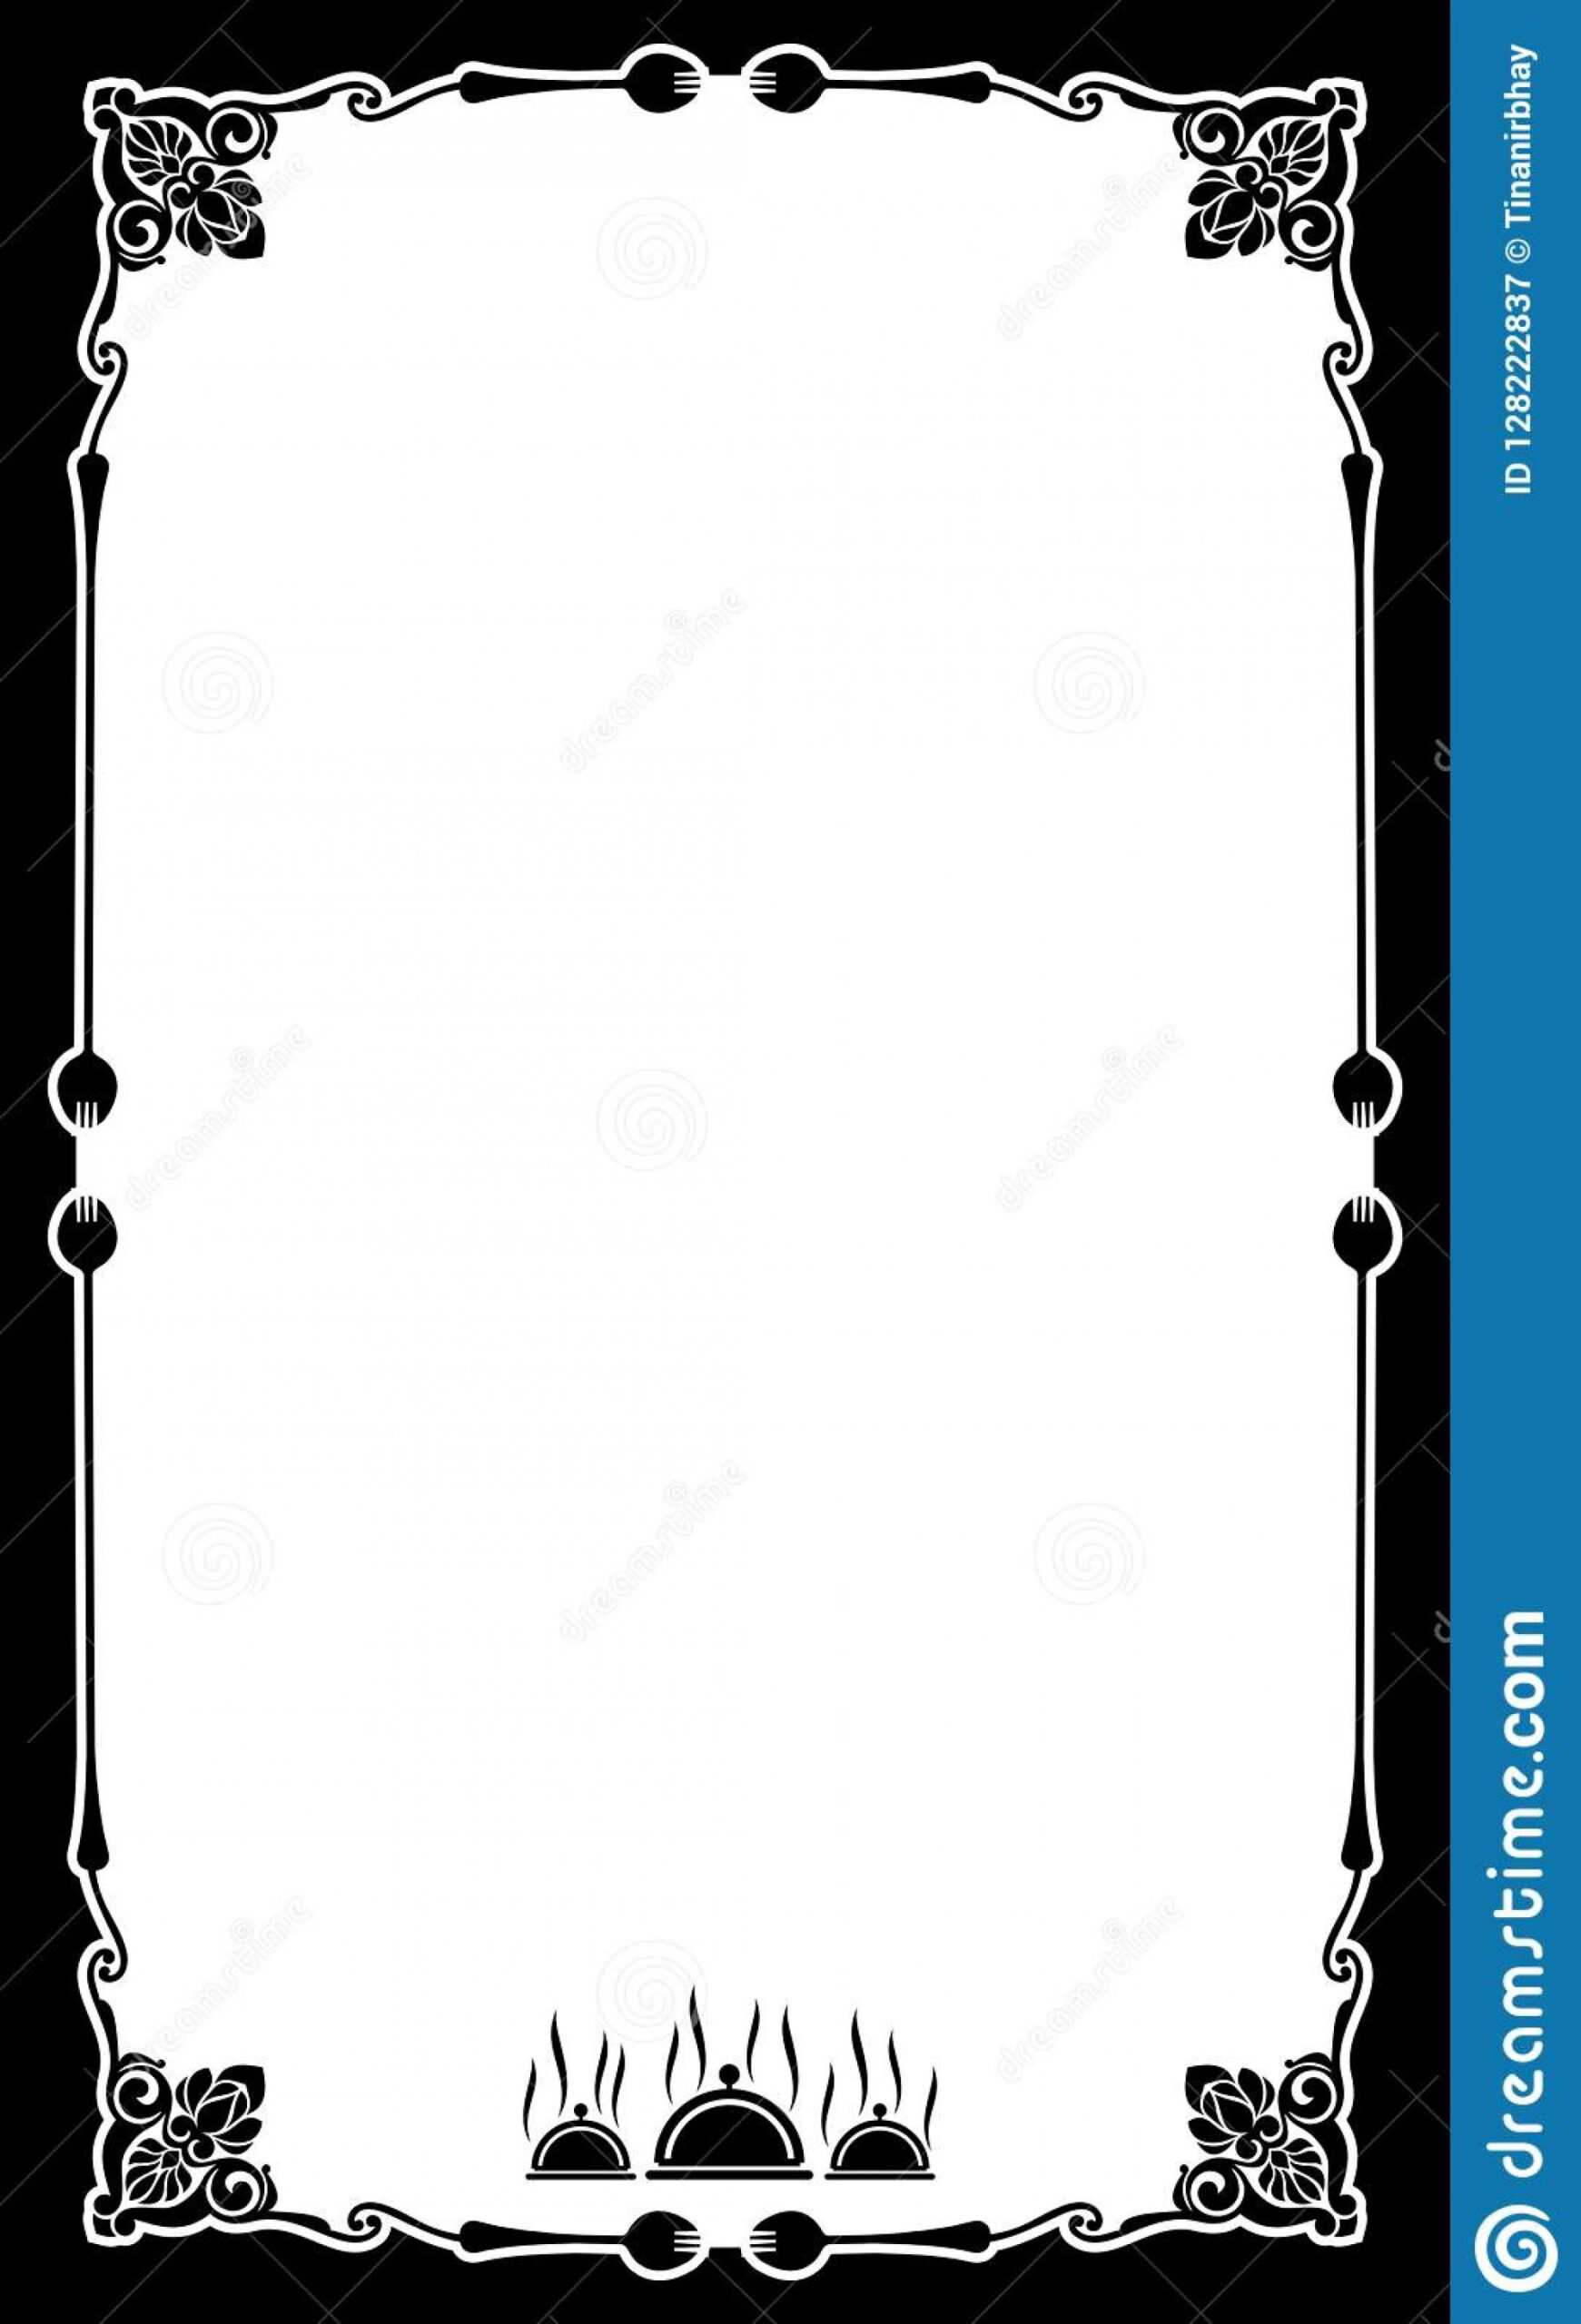 023 Restaurant Menu Card Frame Template Blank Background Regarding Fancy Menu Template